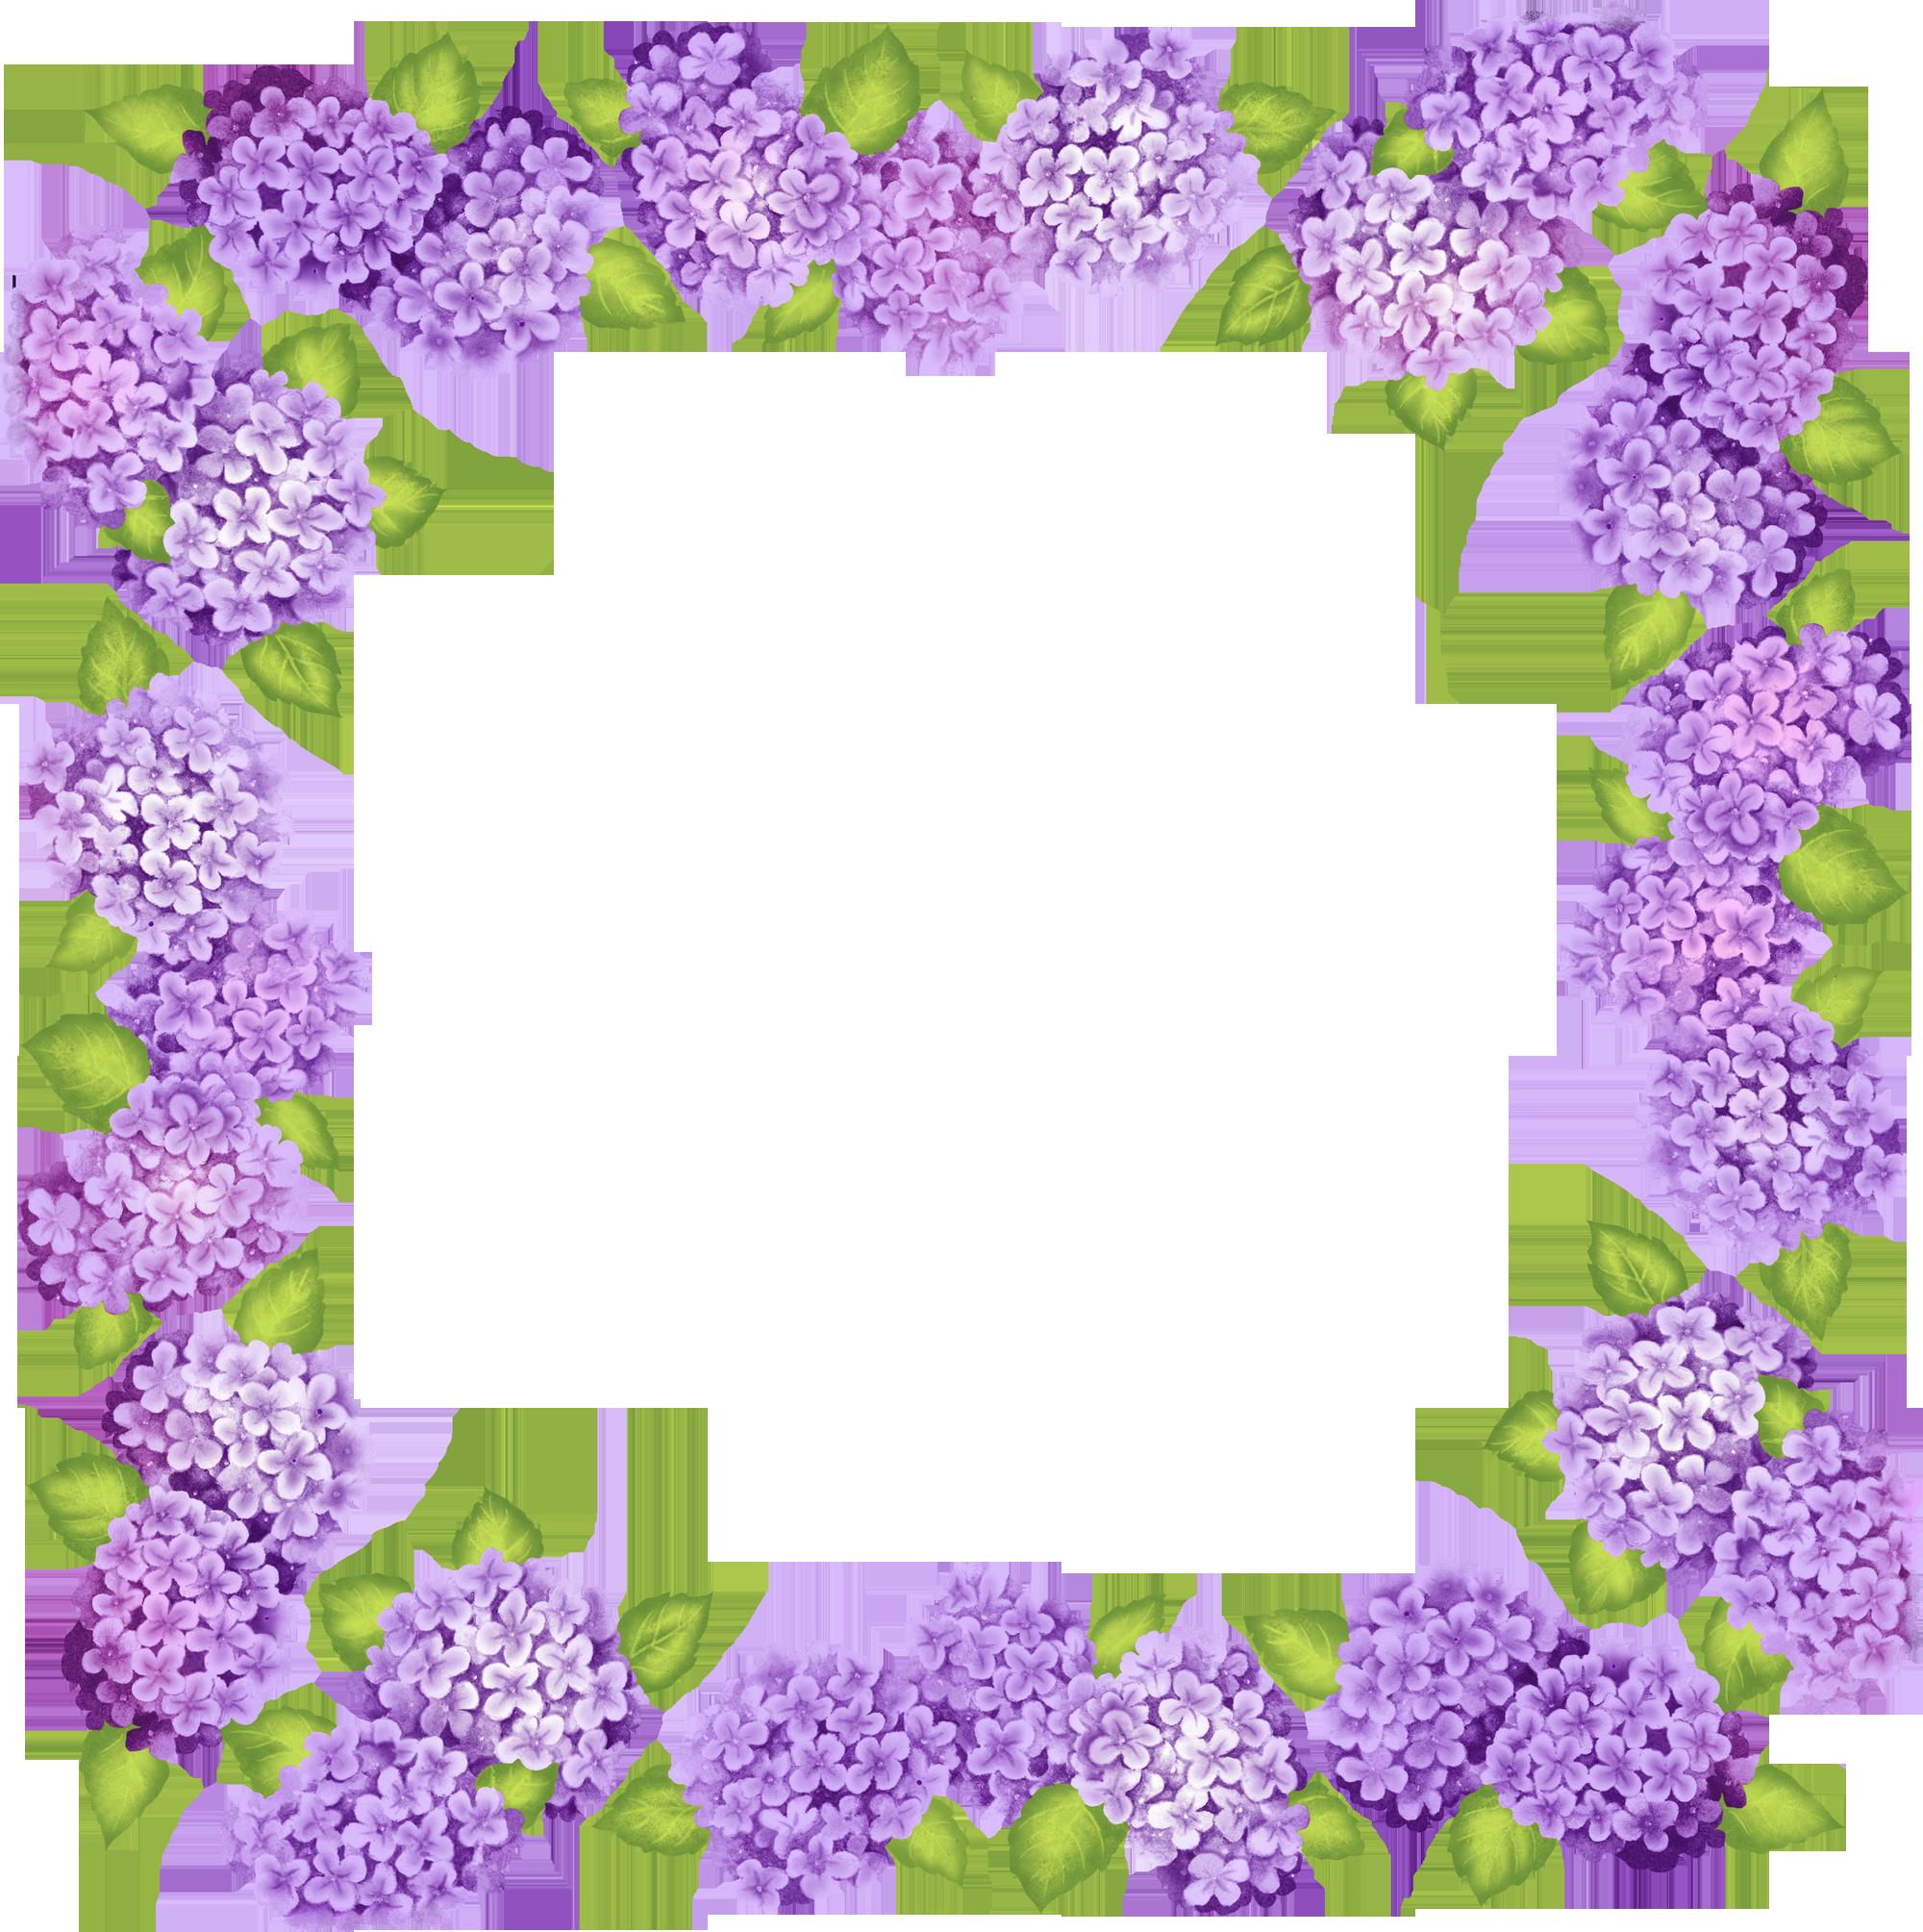 2000x2009 Cute Transparent Purple Flowers Frameu200b Gallery Yopriceville